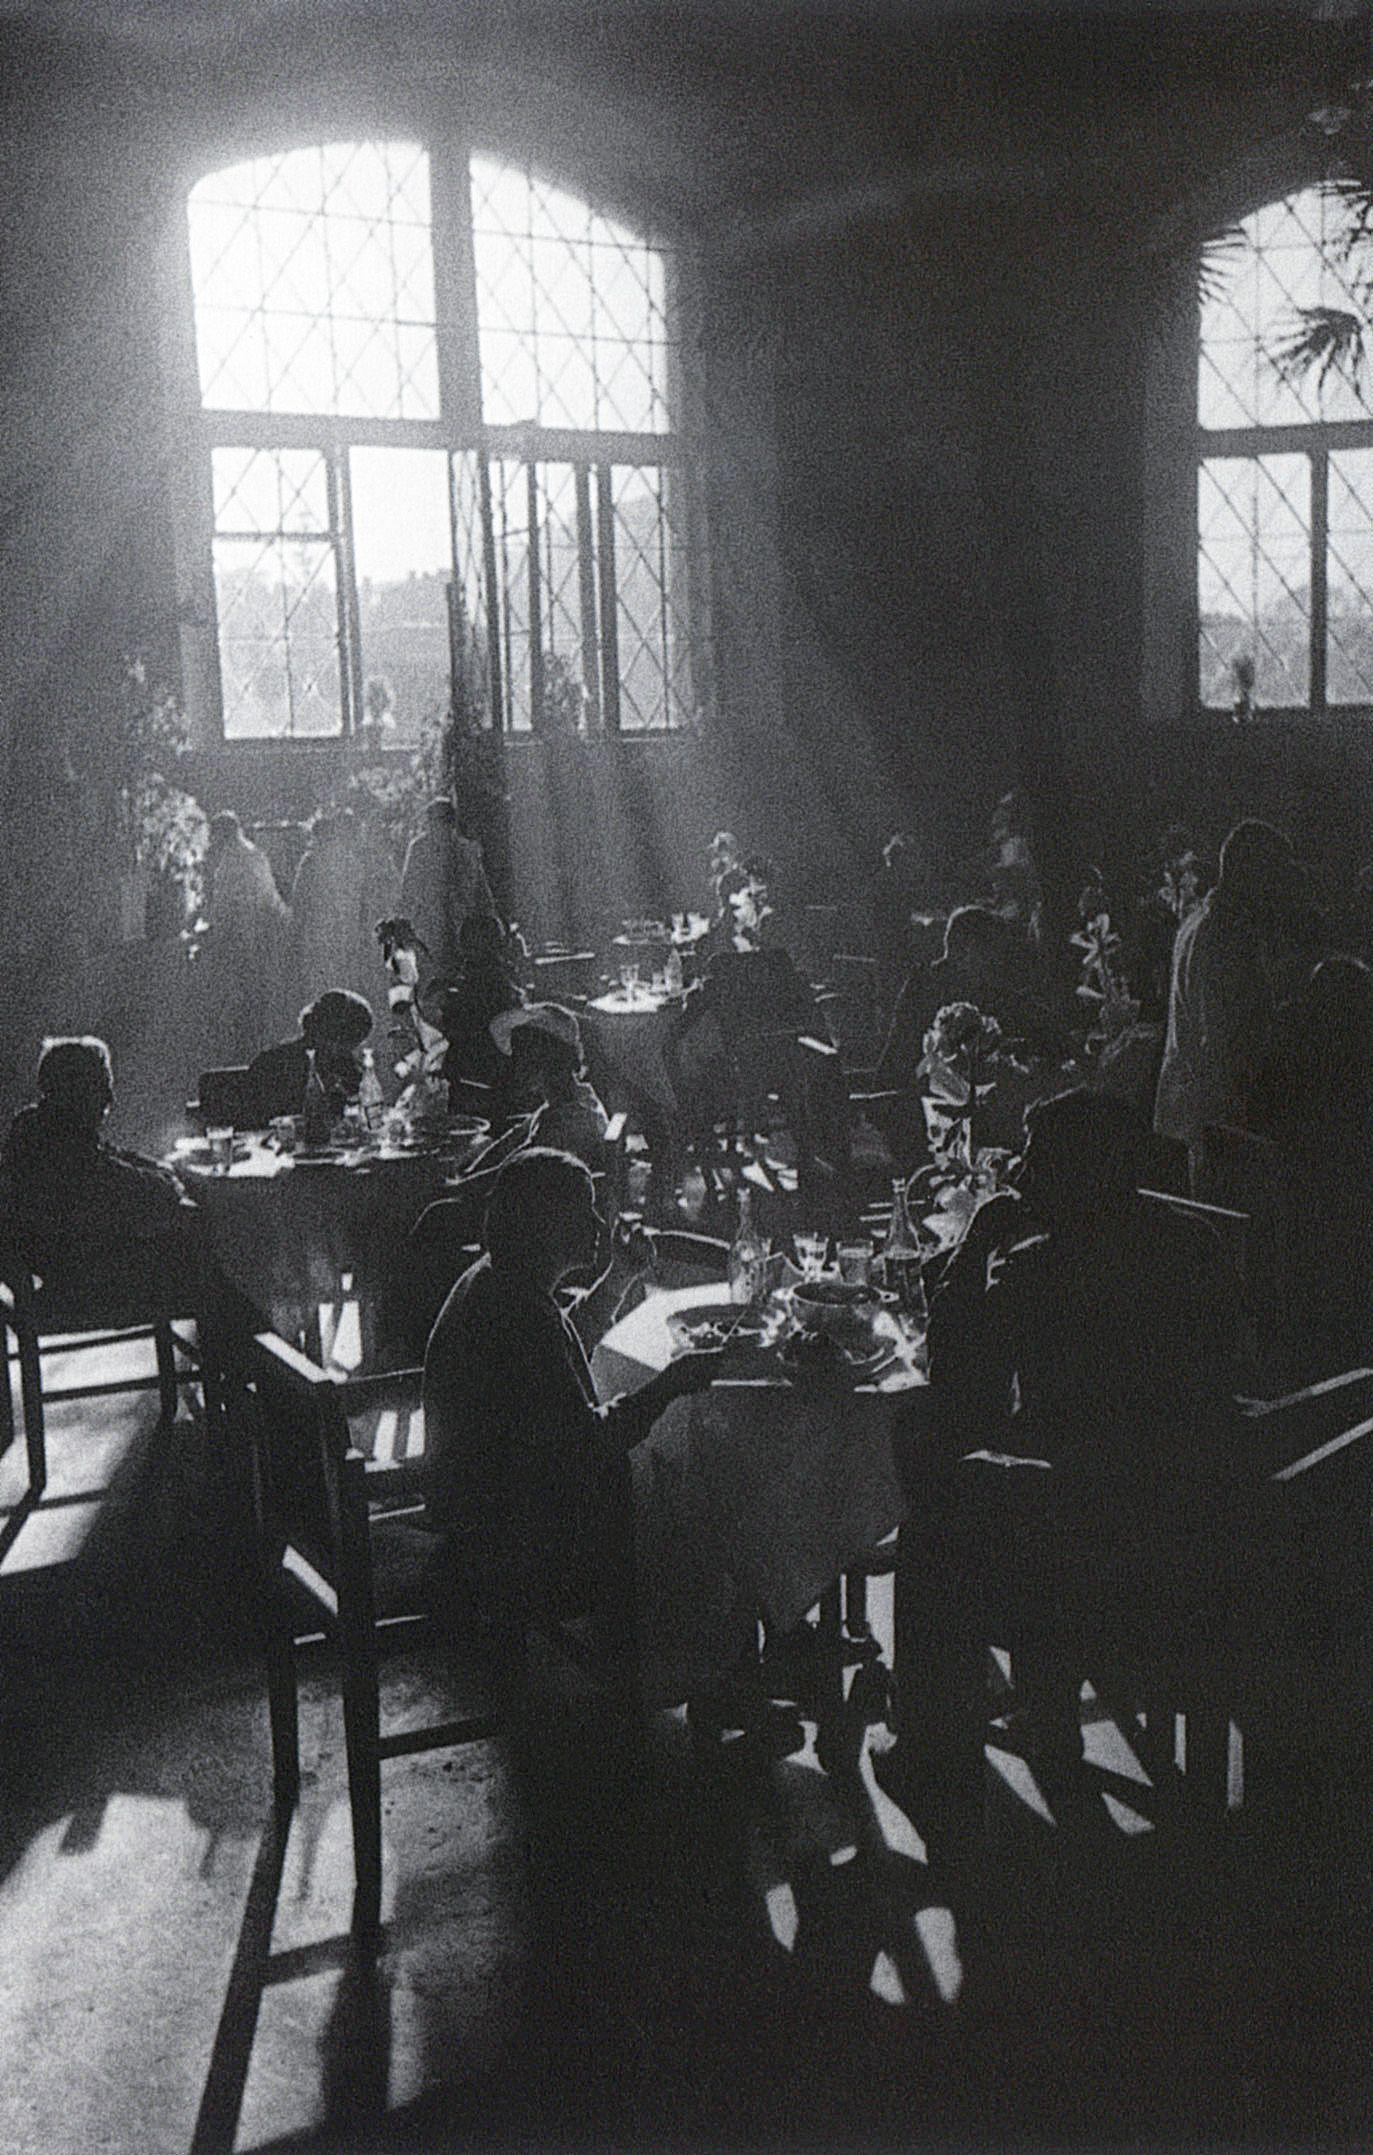 Кафе. Москва. 1936 г.-Arkady Shaikhet (1898-1959)